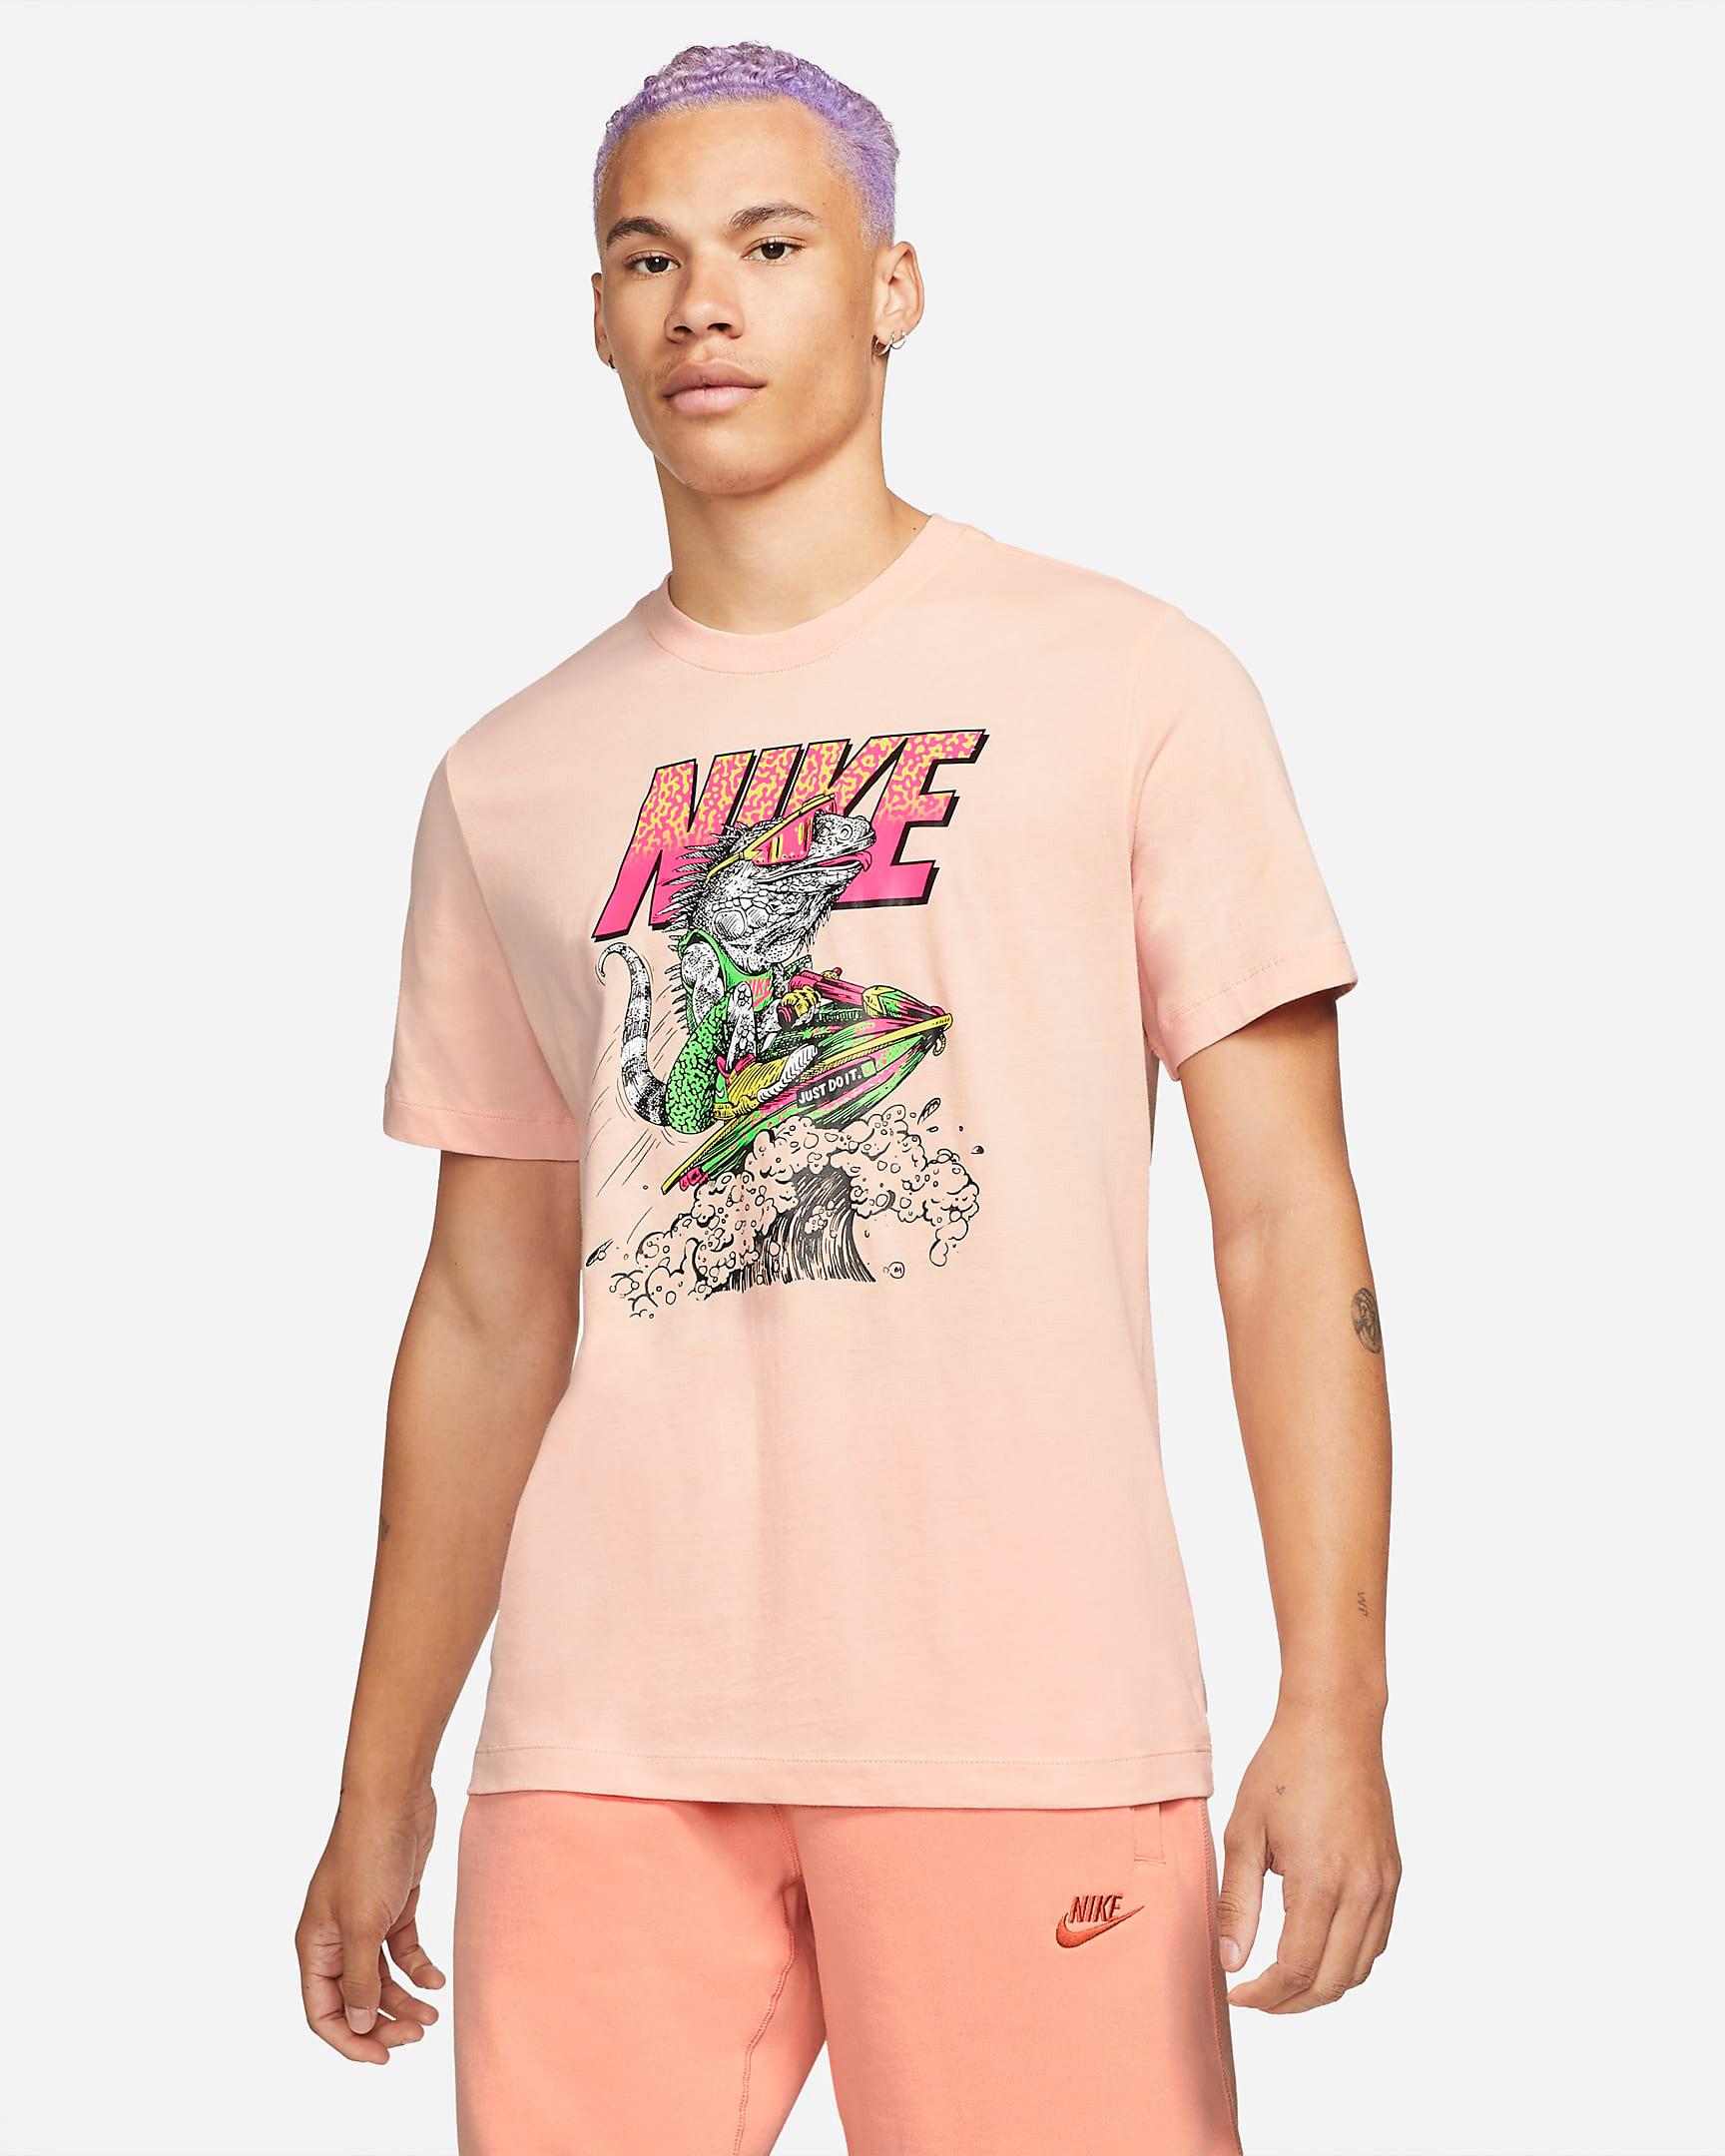 nike-arctic-orange-graphic-tee-shirt